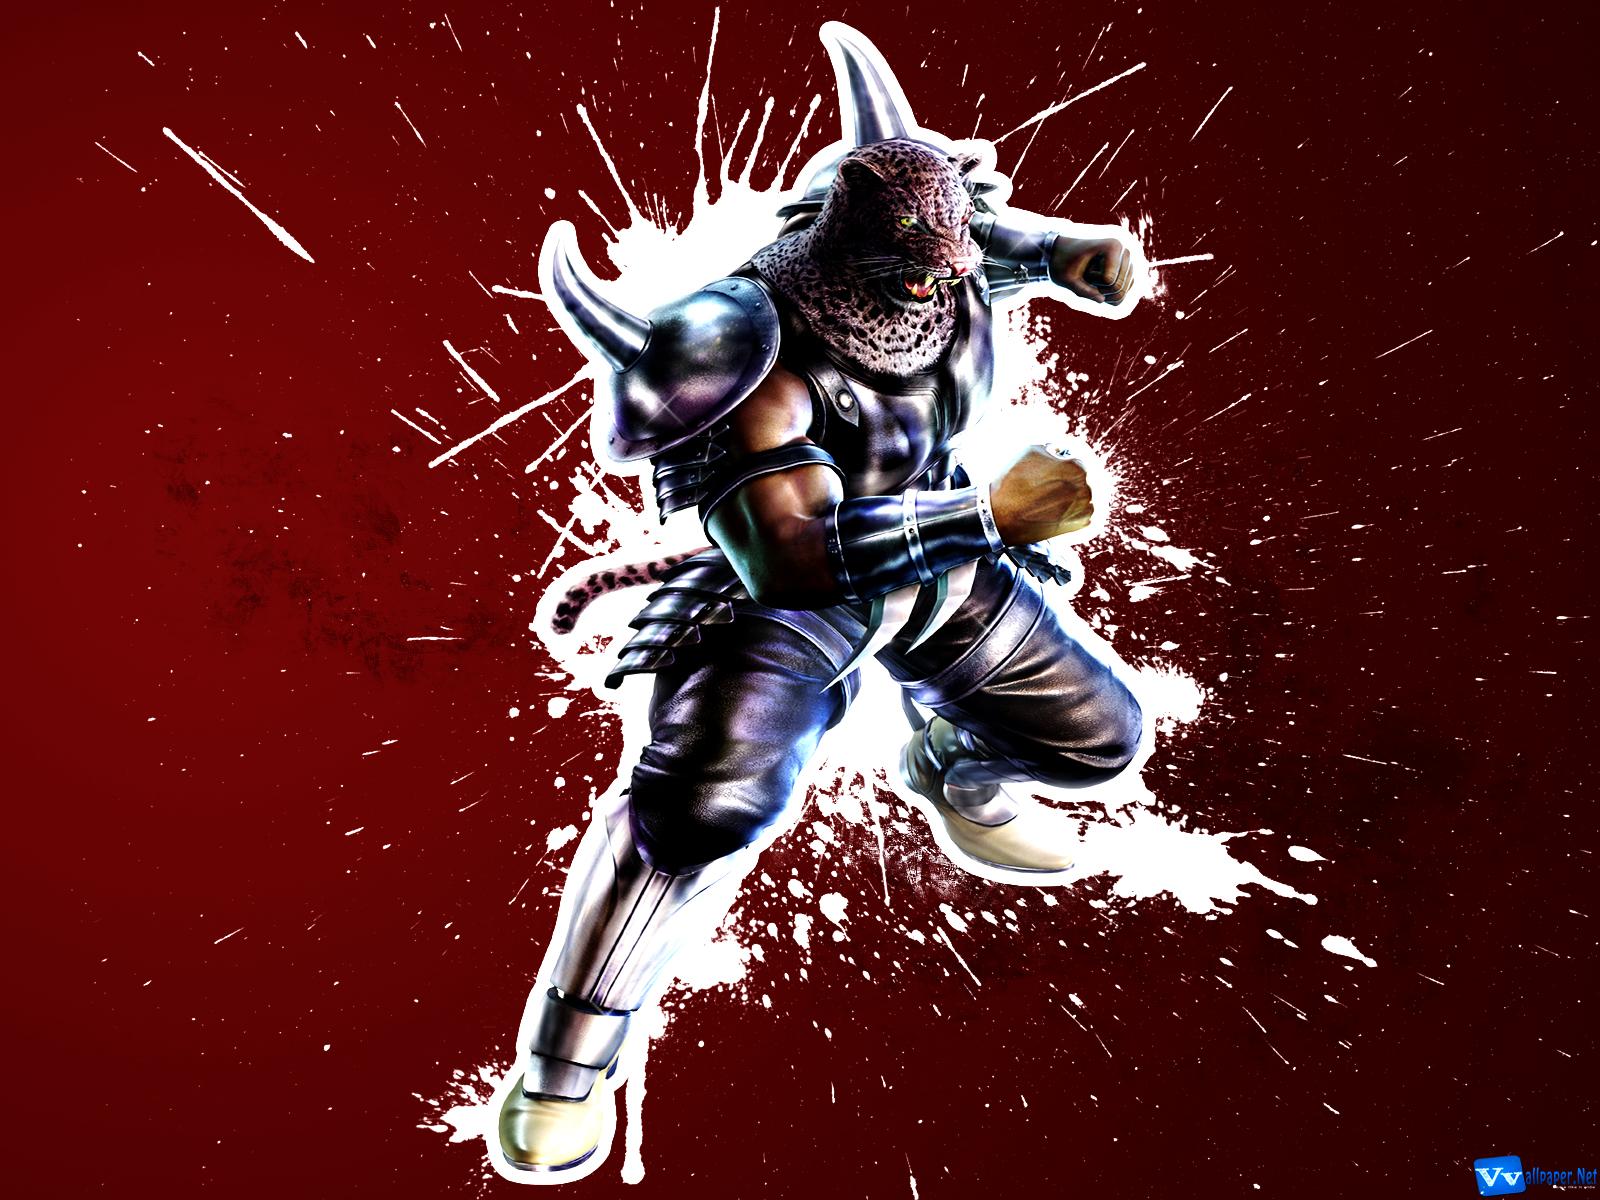 Armor King Tekken HD Wallpapers